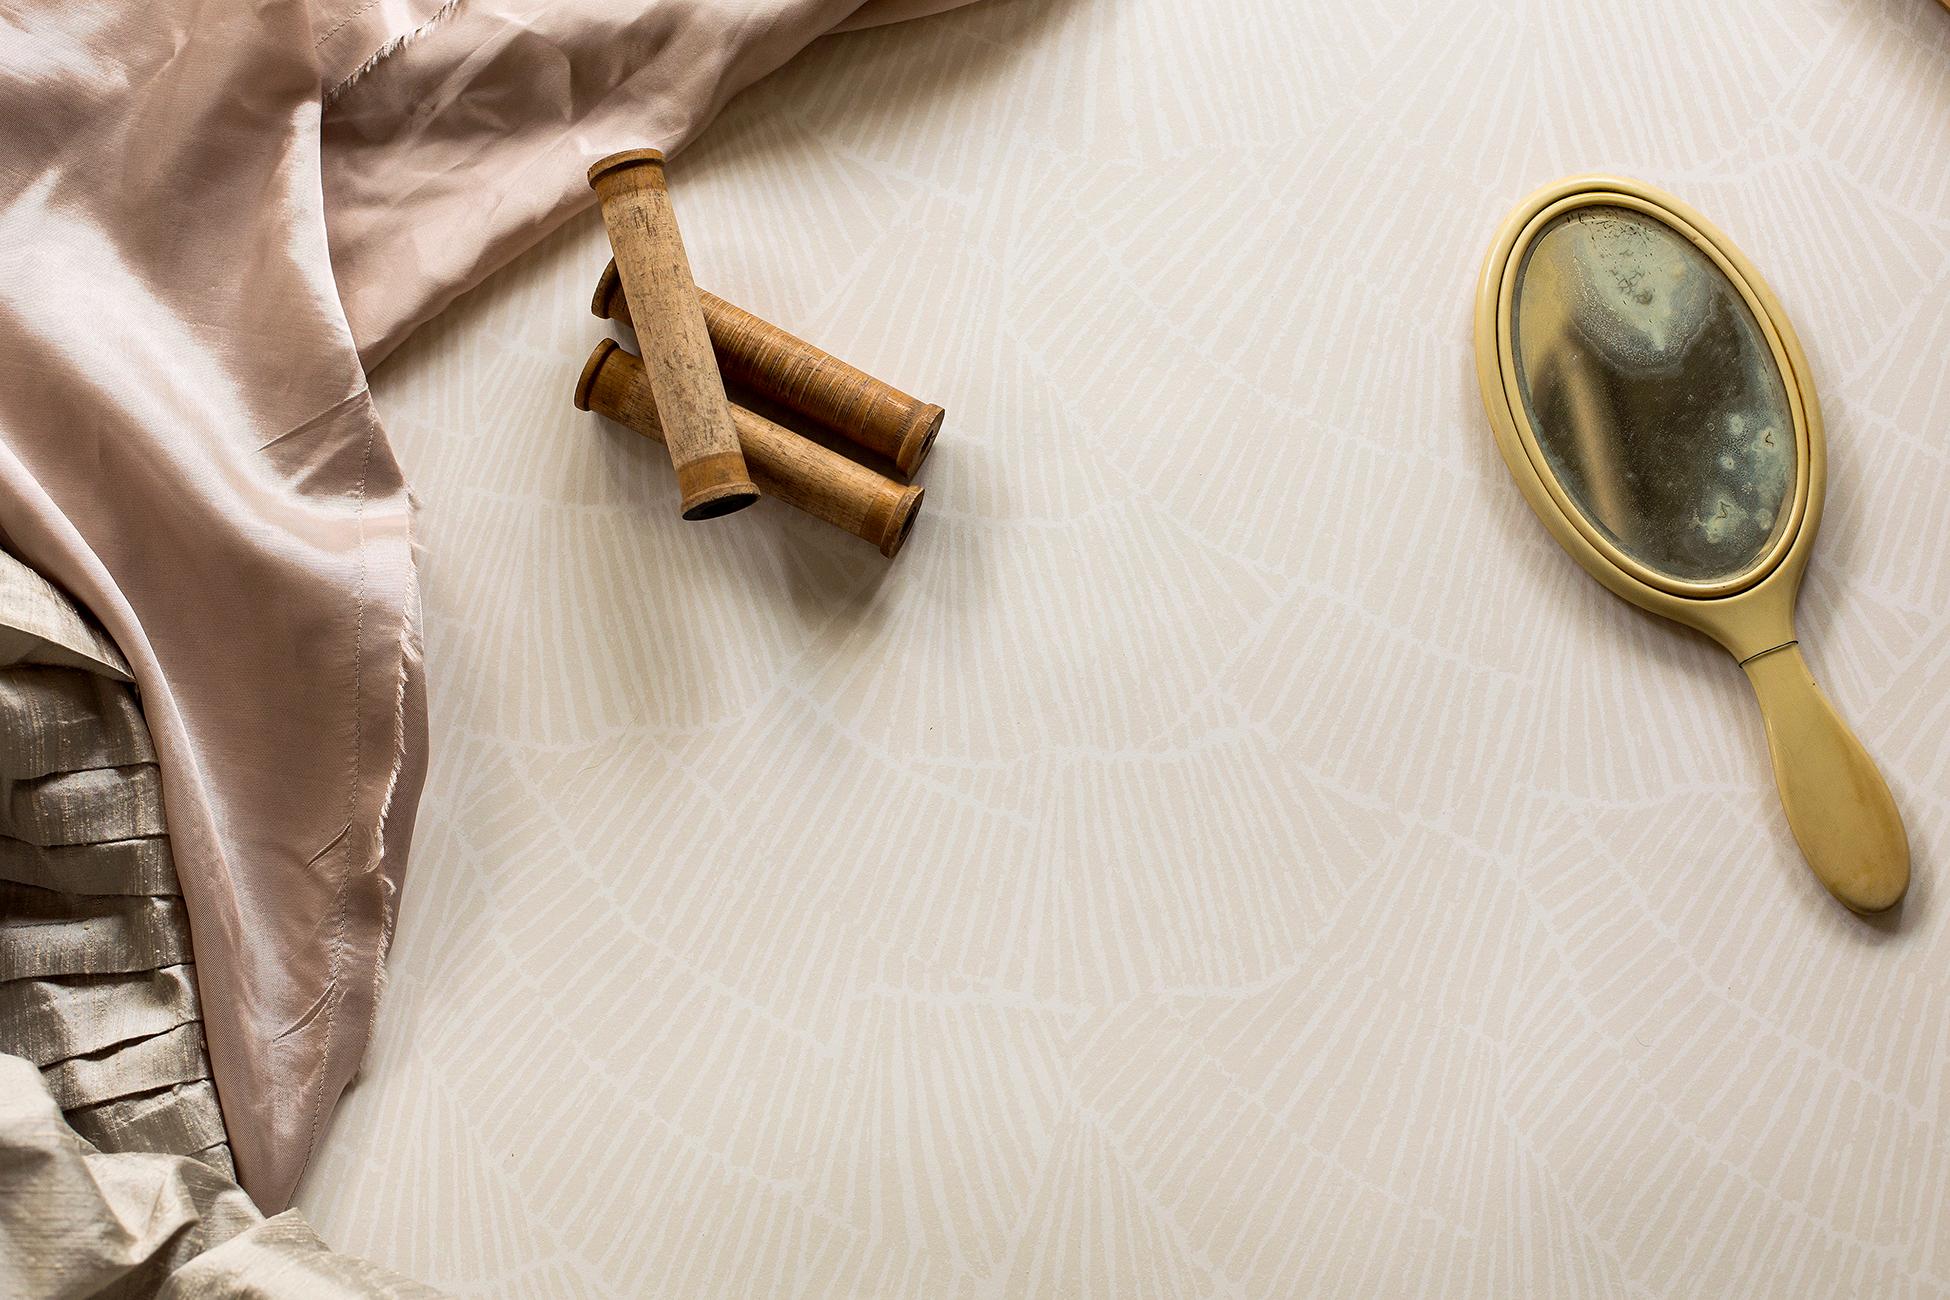 Pleat Cream Wallpaper Styled